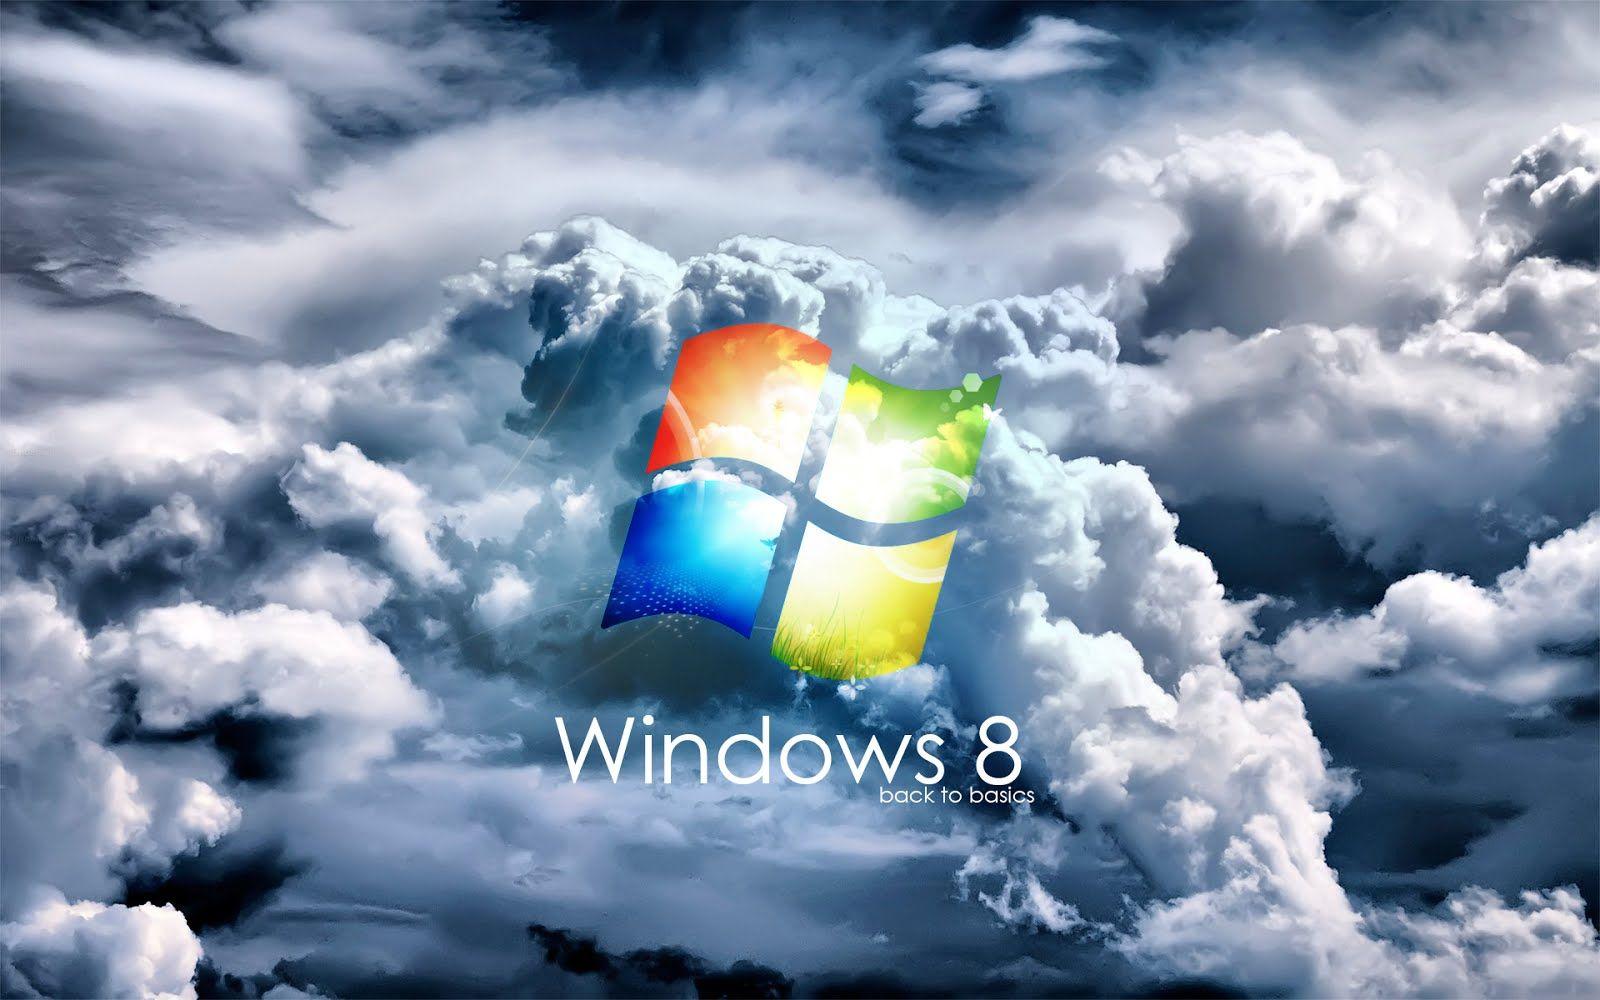 New Kumpulan Wallpaper Windows 8 Gratis Terbaru 2014 Enetter Cloud Wallpaper 3d Nature Wallpaper Hd Wallpaper Desktop